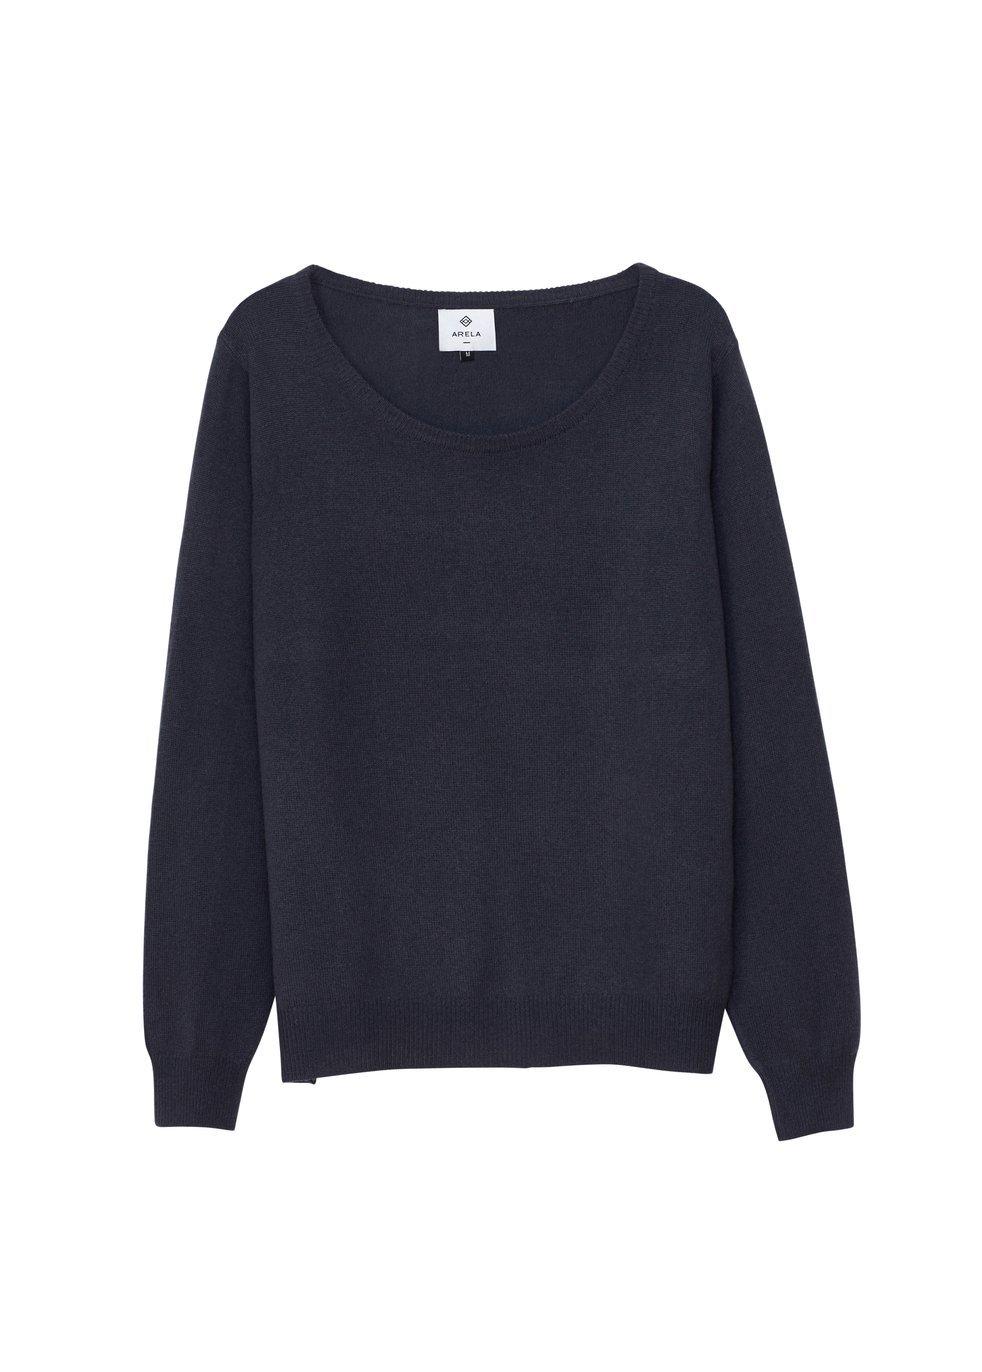 ARELA Laine Cashmere Sweater In Dark Grey